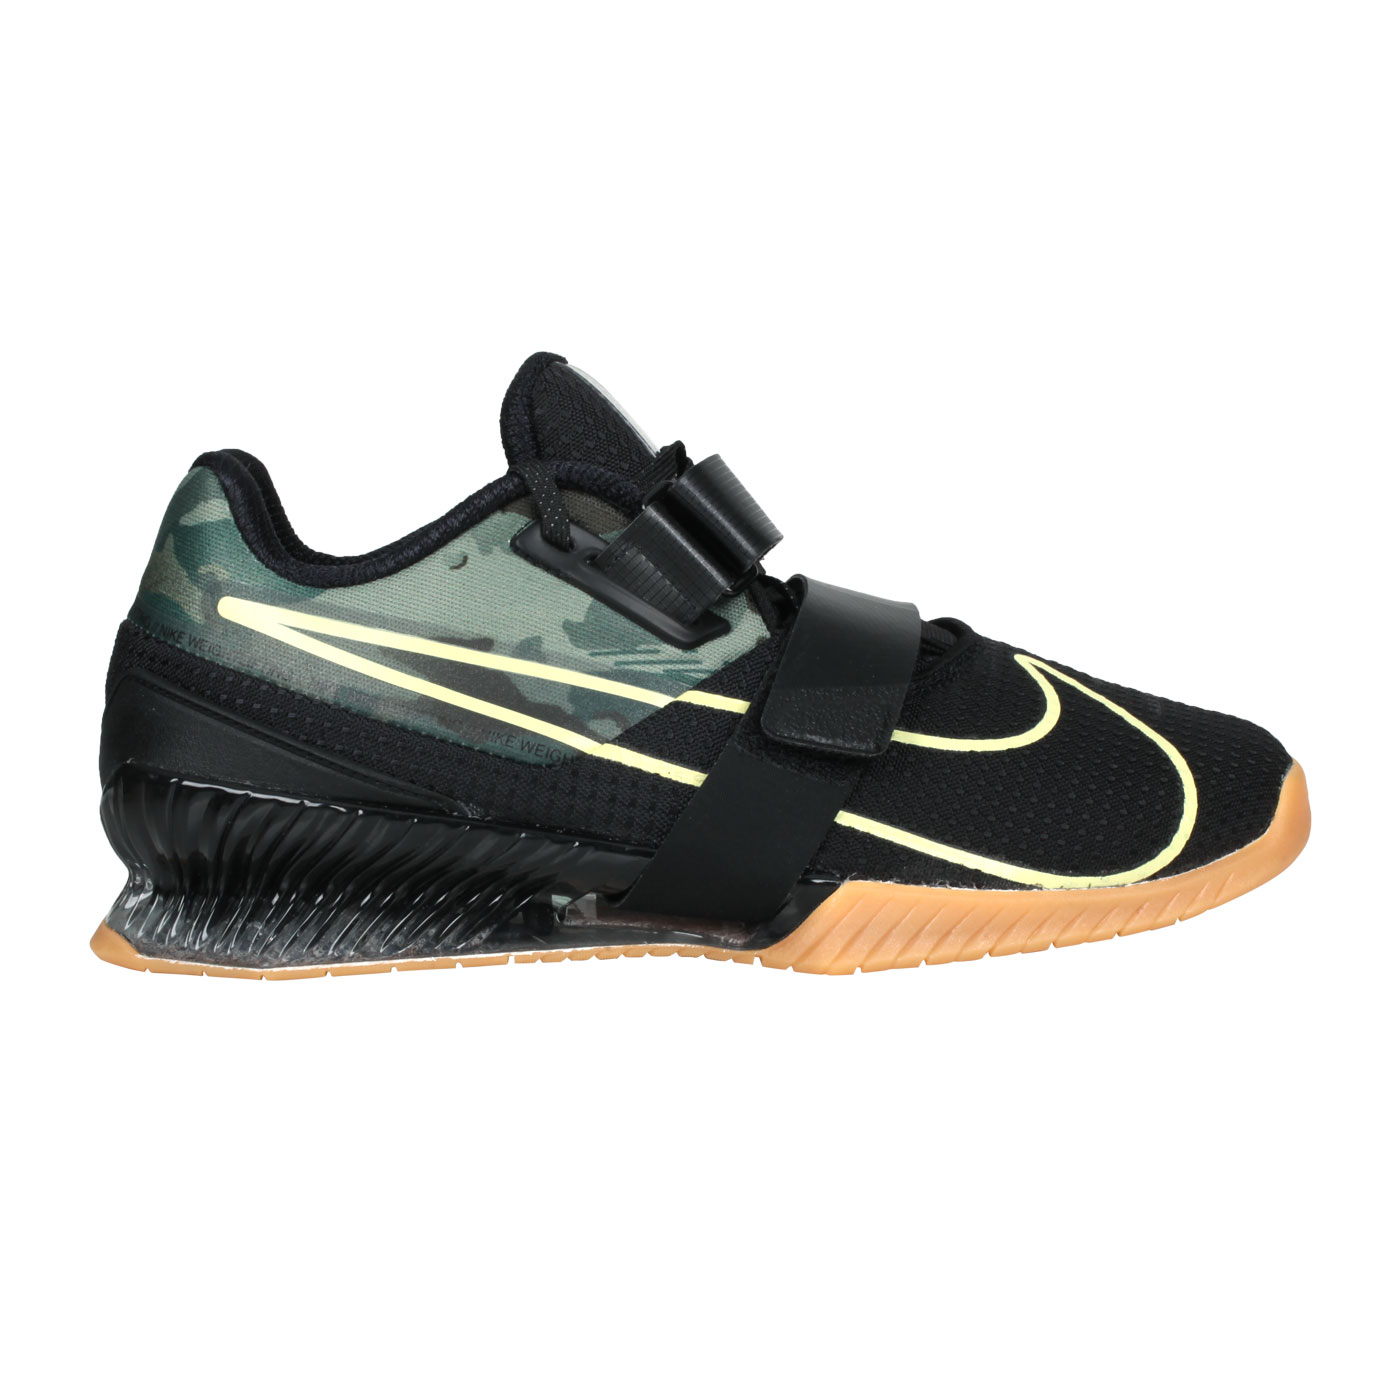 NIKE 舉重鞋  @ ROMALEOS 4@CD3463032 - 黑綠黃